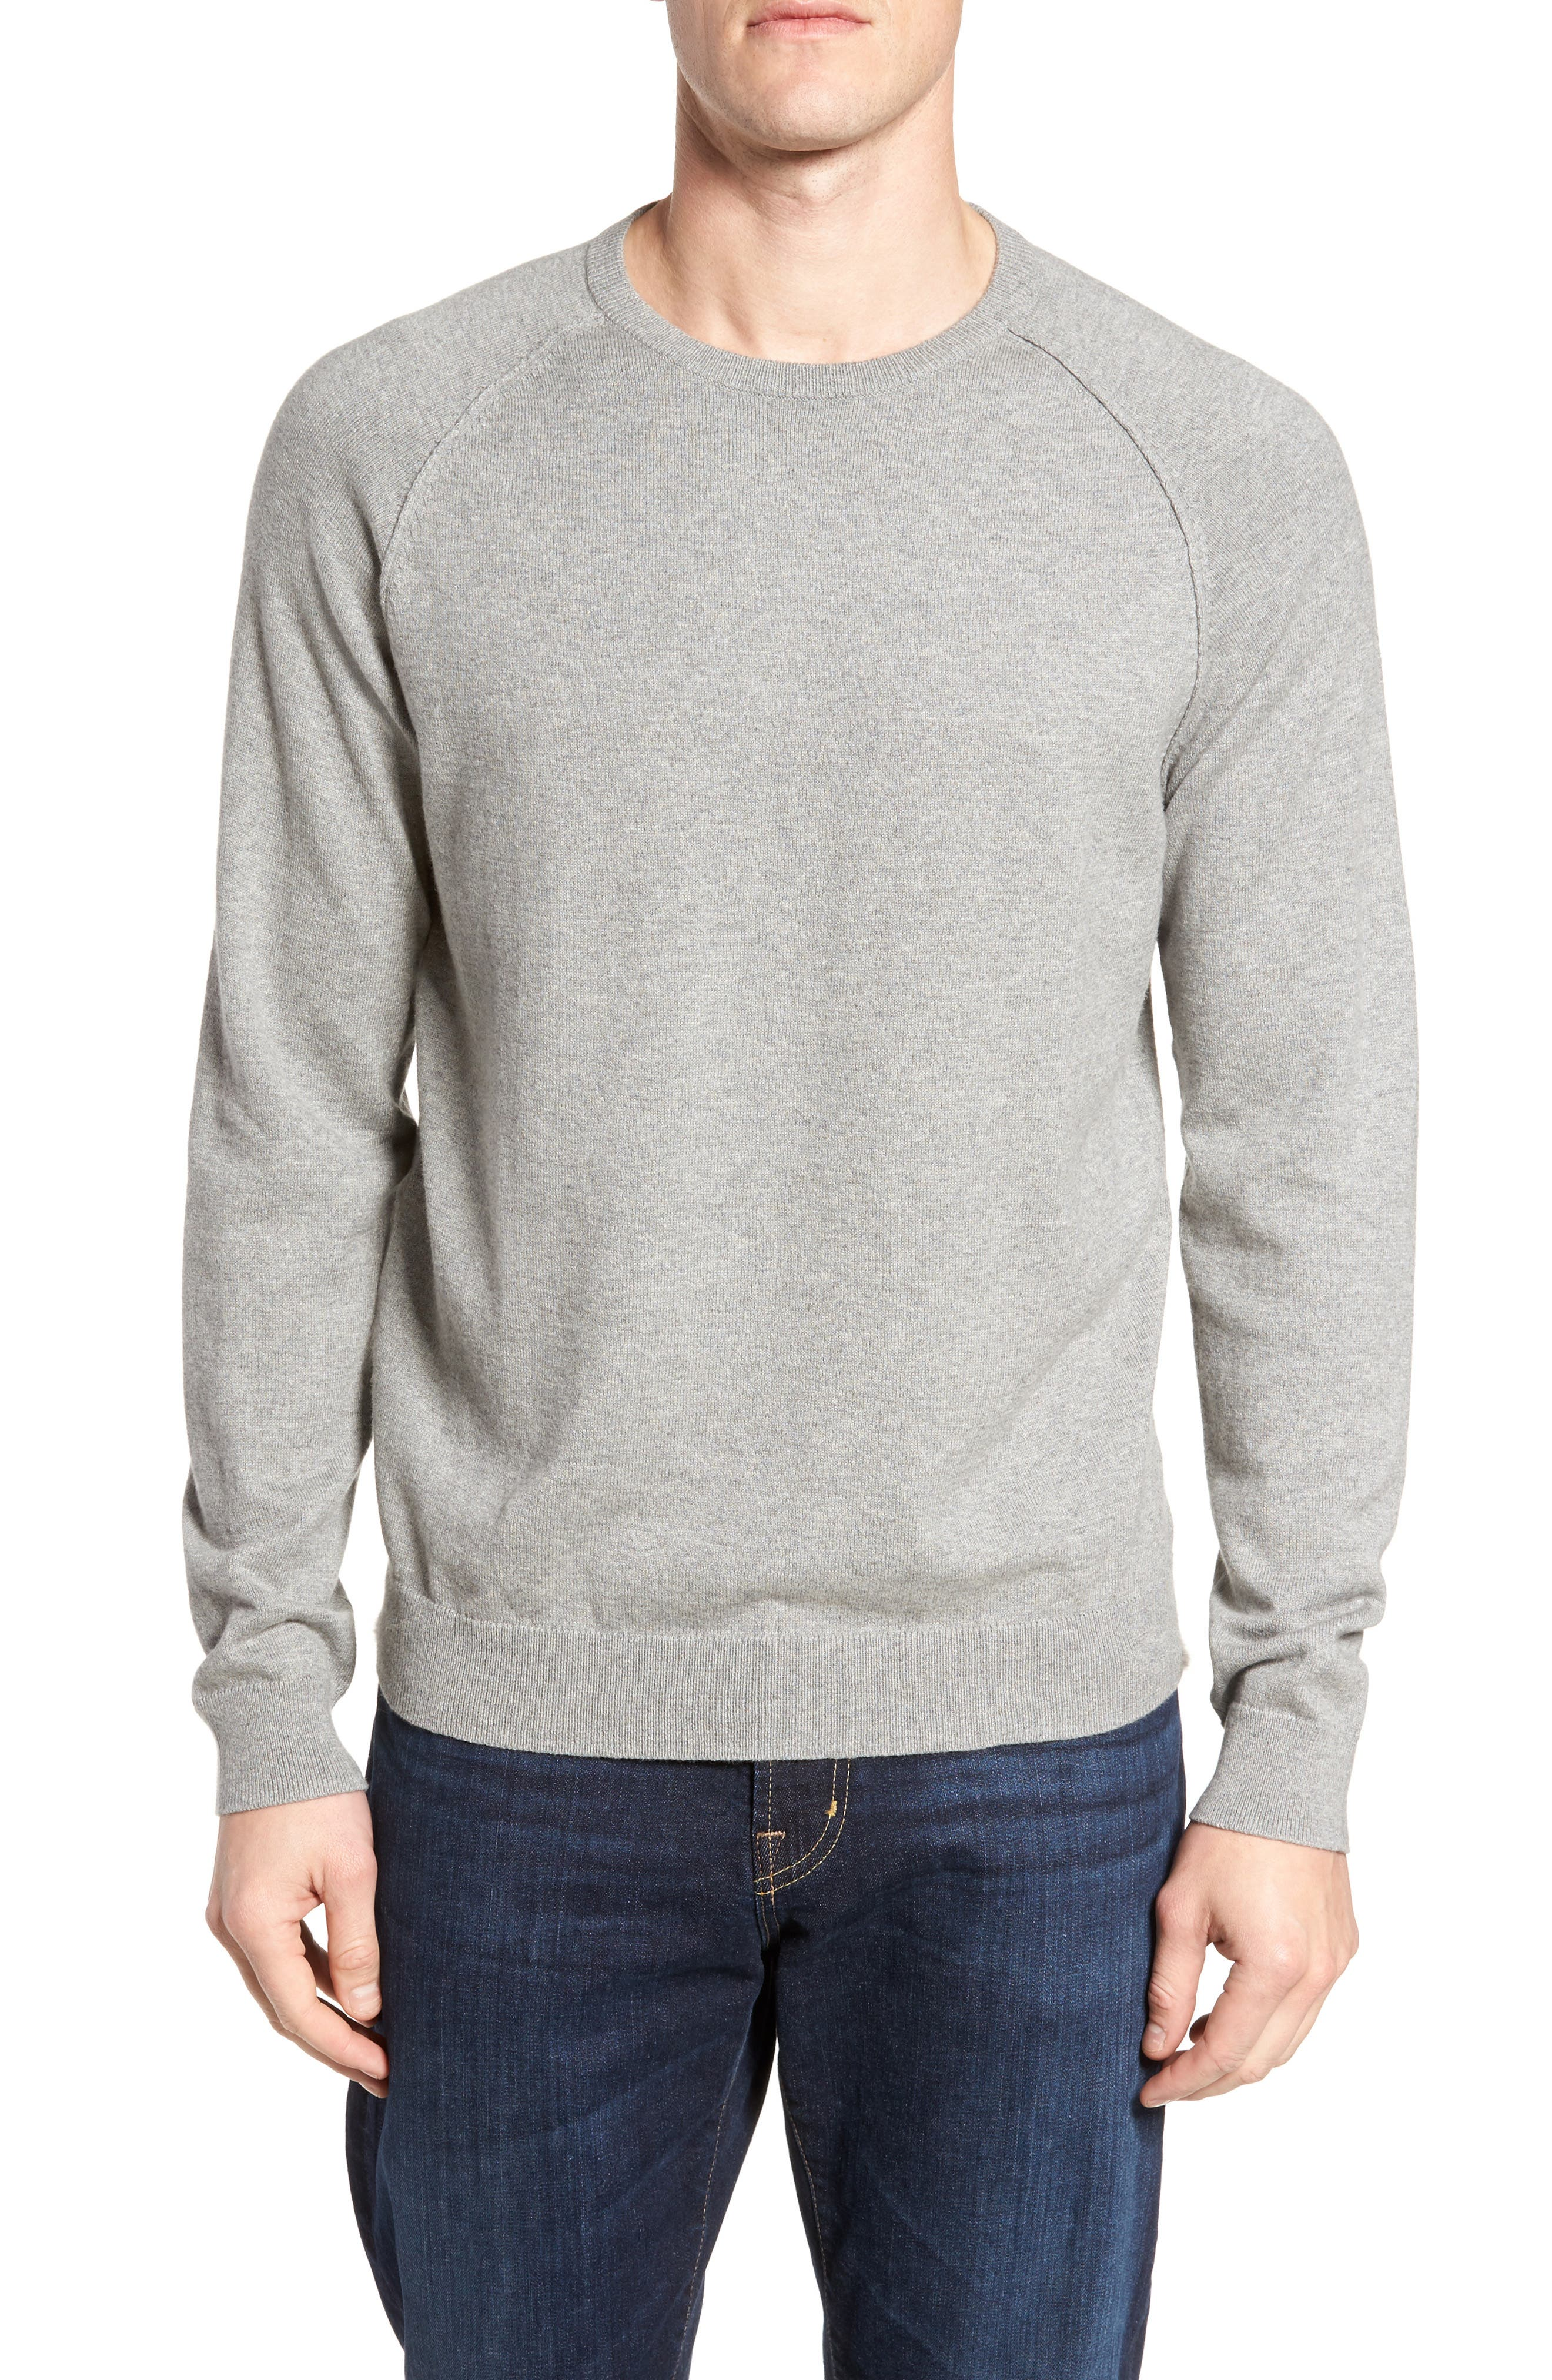 Saddle Shoulder Cotton & Cashmere Sweater,                         Main,                         color, Grey Heather